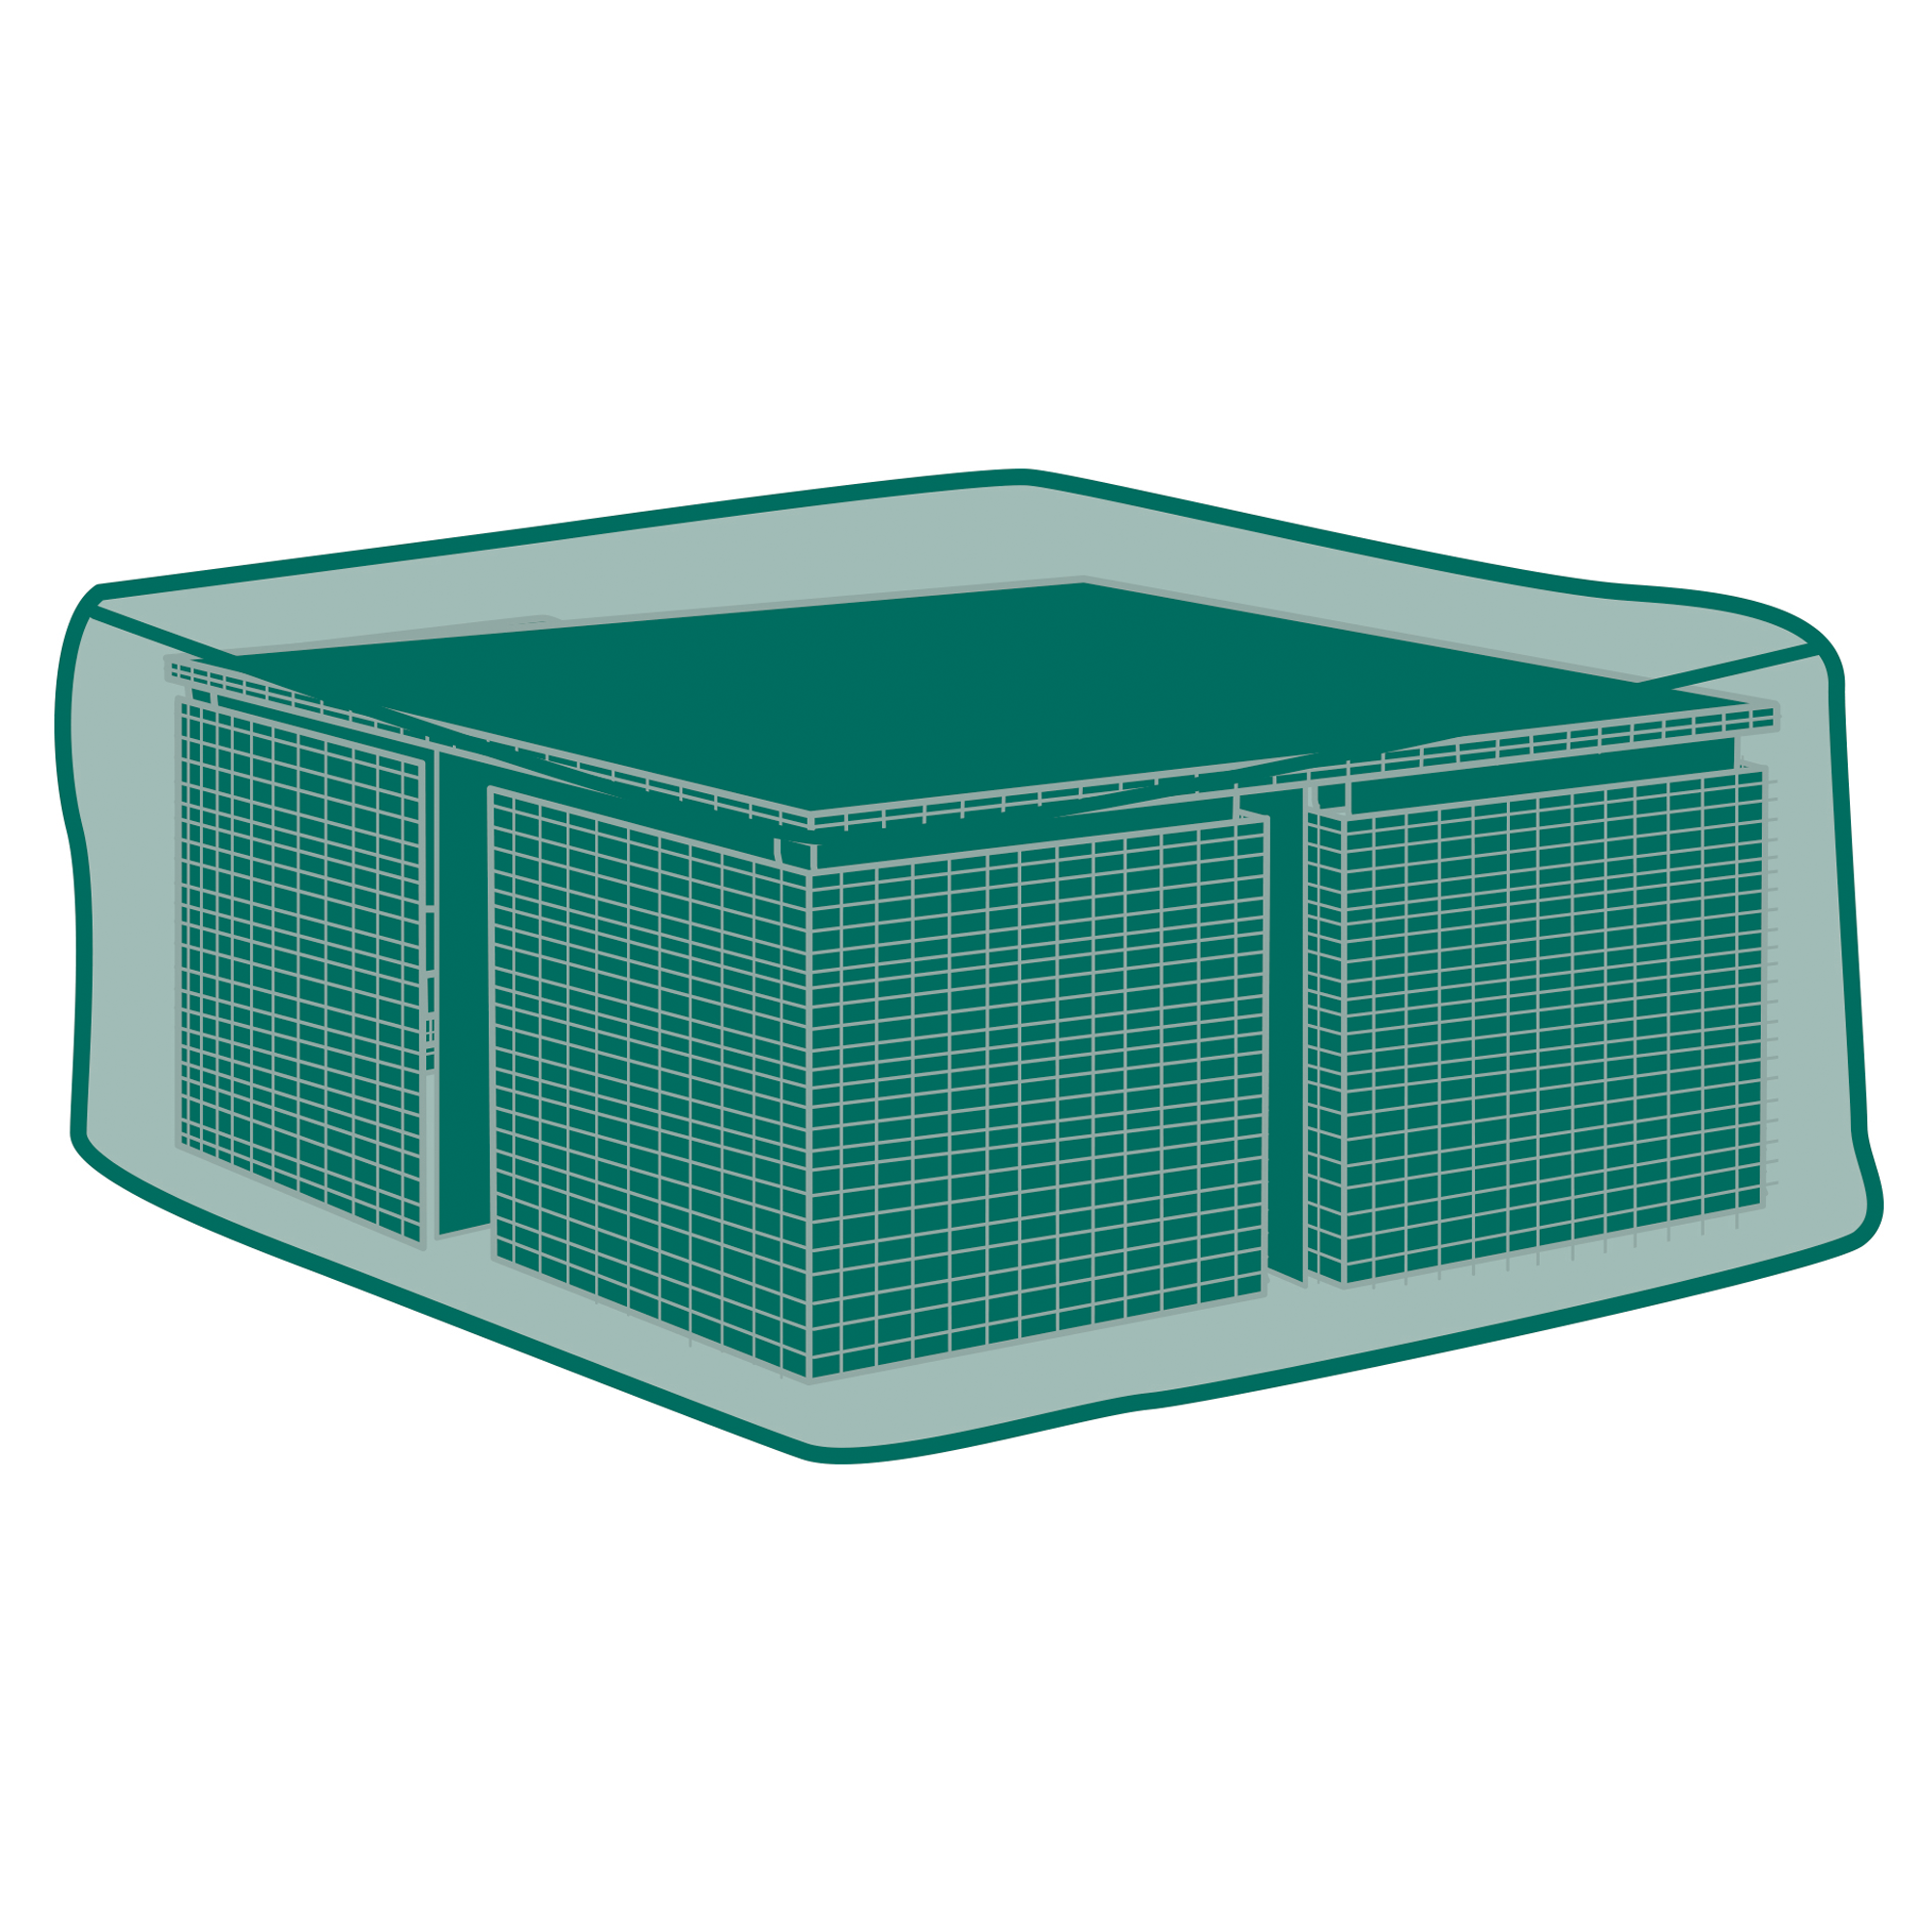 Schutzhulle Fur Gartenmobel Set Cube Transparent 121 X 121 X 74 Cm